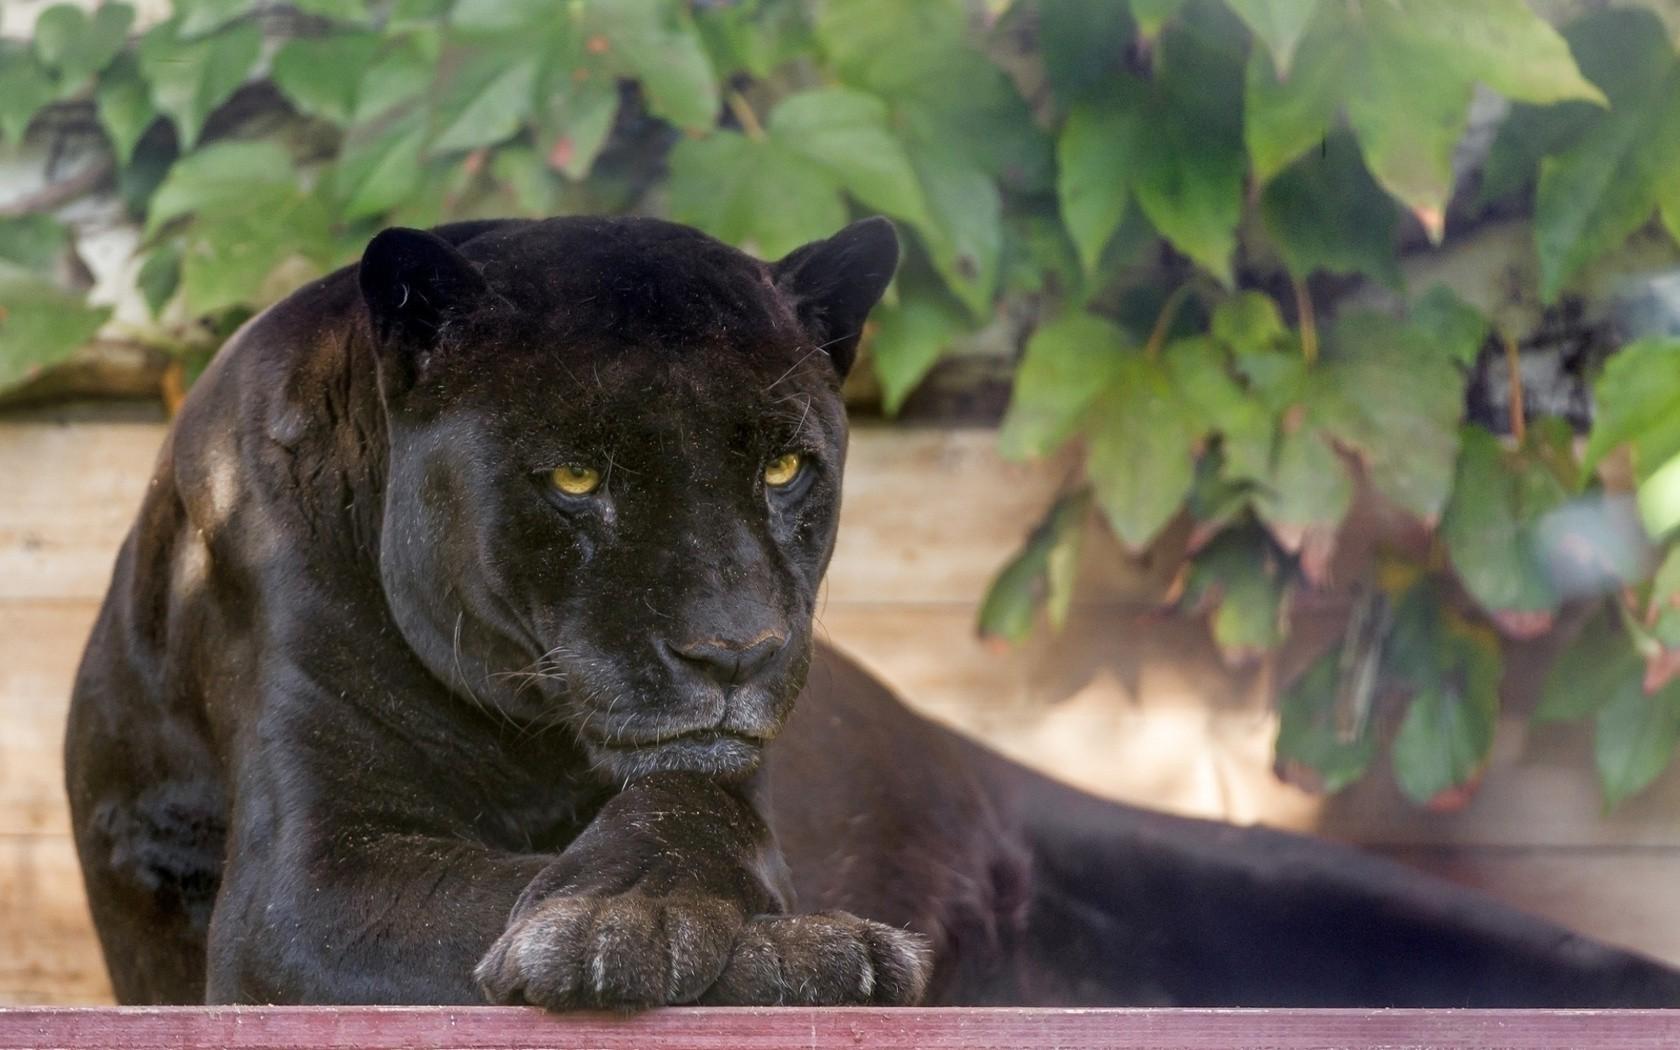 Black Panther Animal Wallpapers: Animals, Black Panther Wallpapers HD / Desktop And Mobile